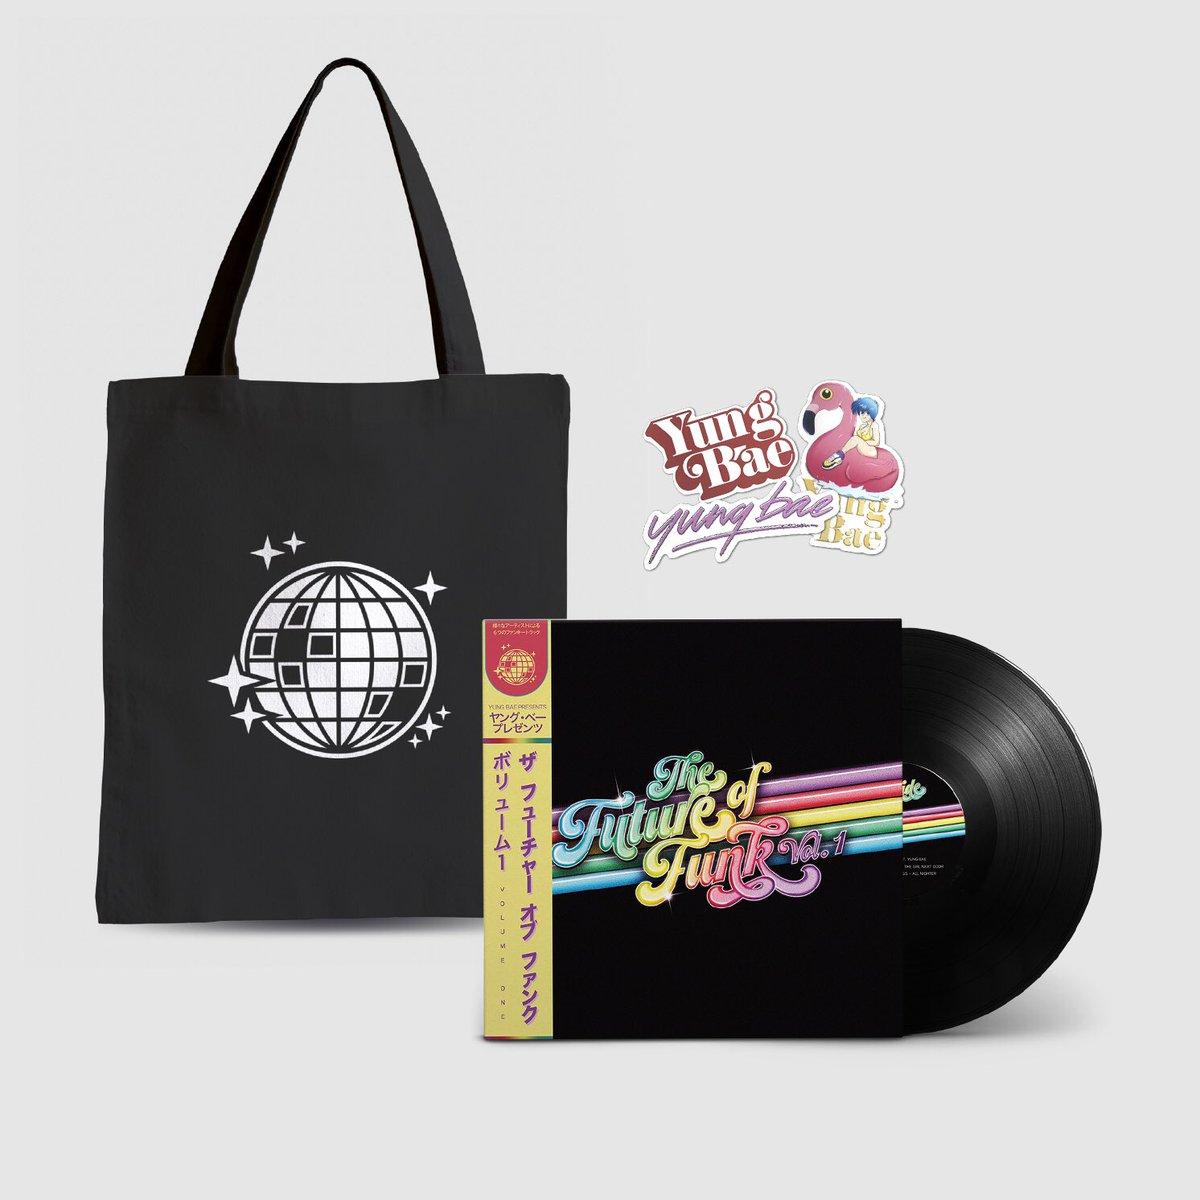 3/27/2019 - Cassettes / Vinyl Release & News 3